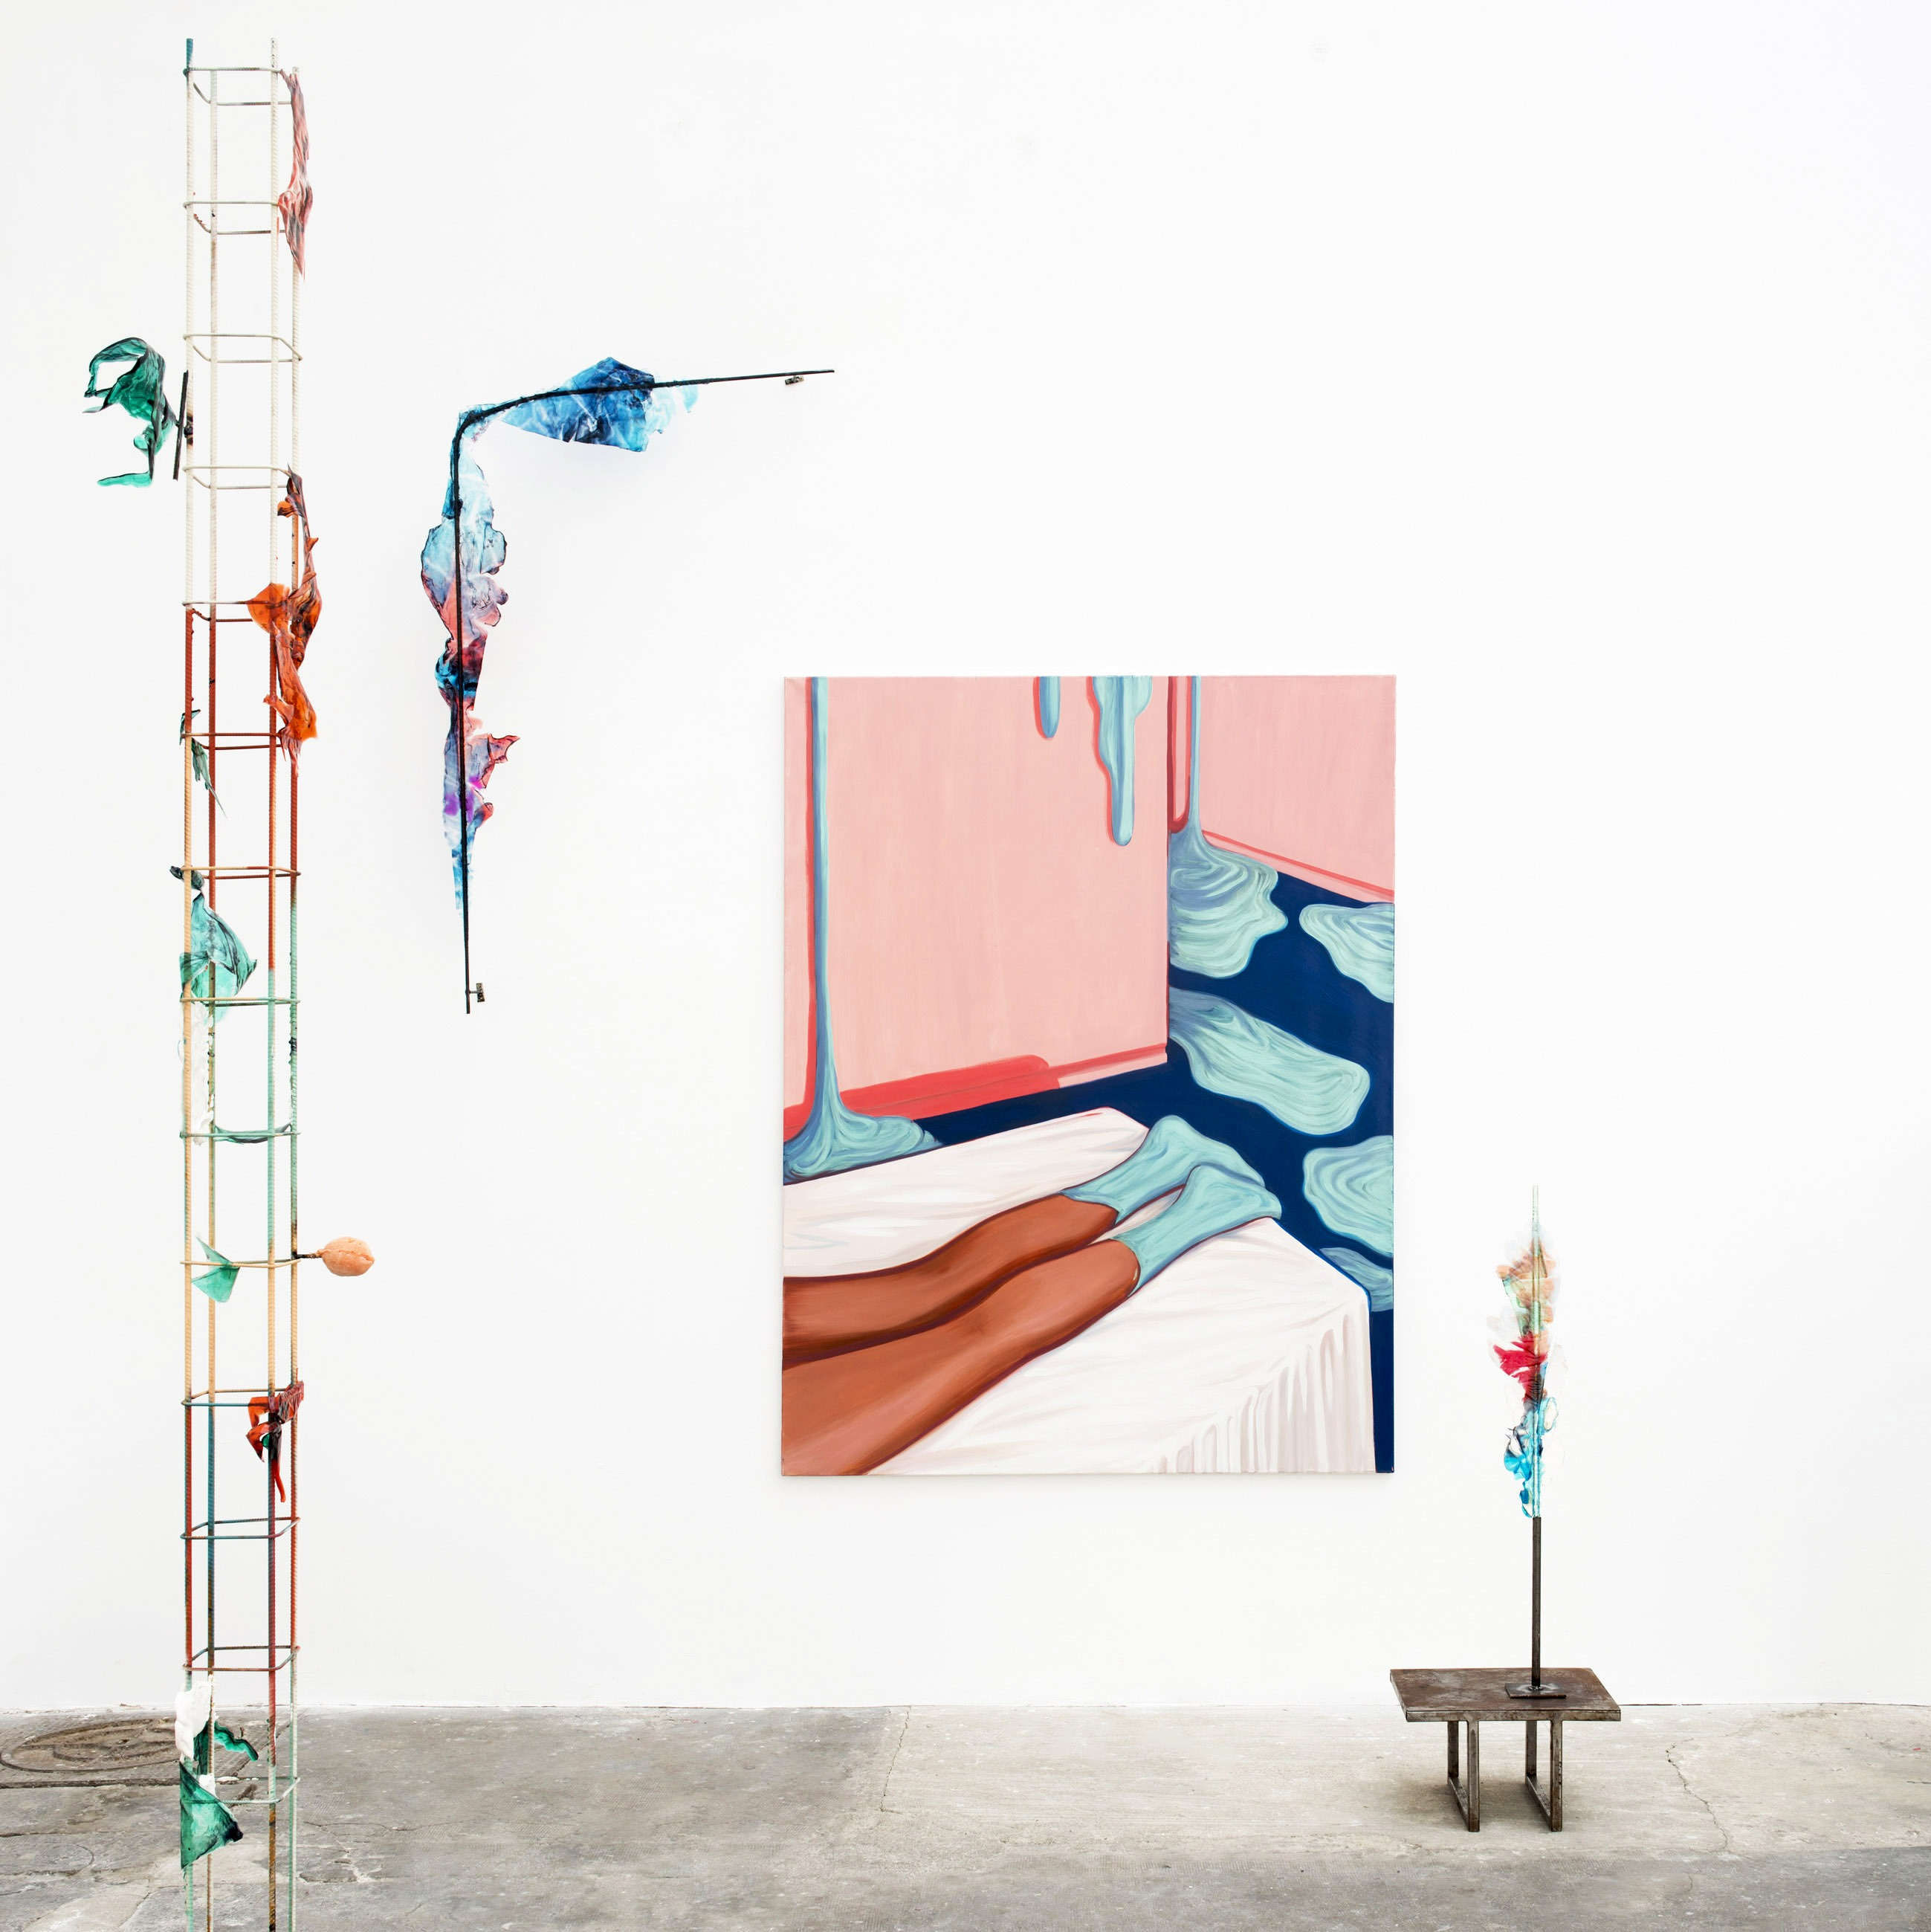 Duo Show avec Lise Stoufflet / Galerie Bugada & Cargnel